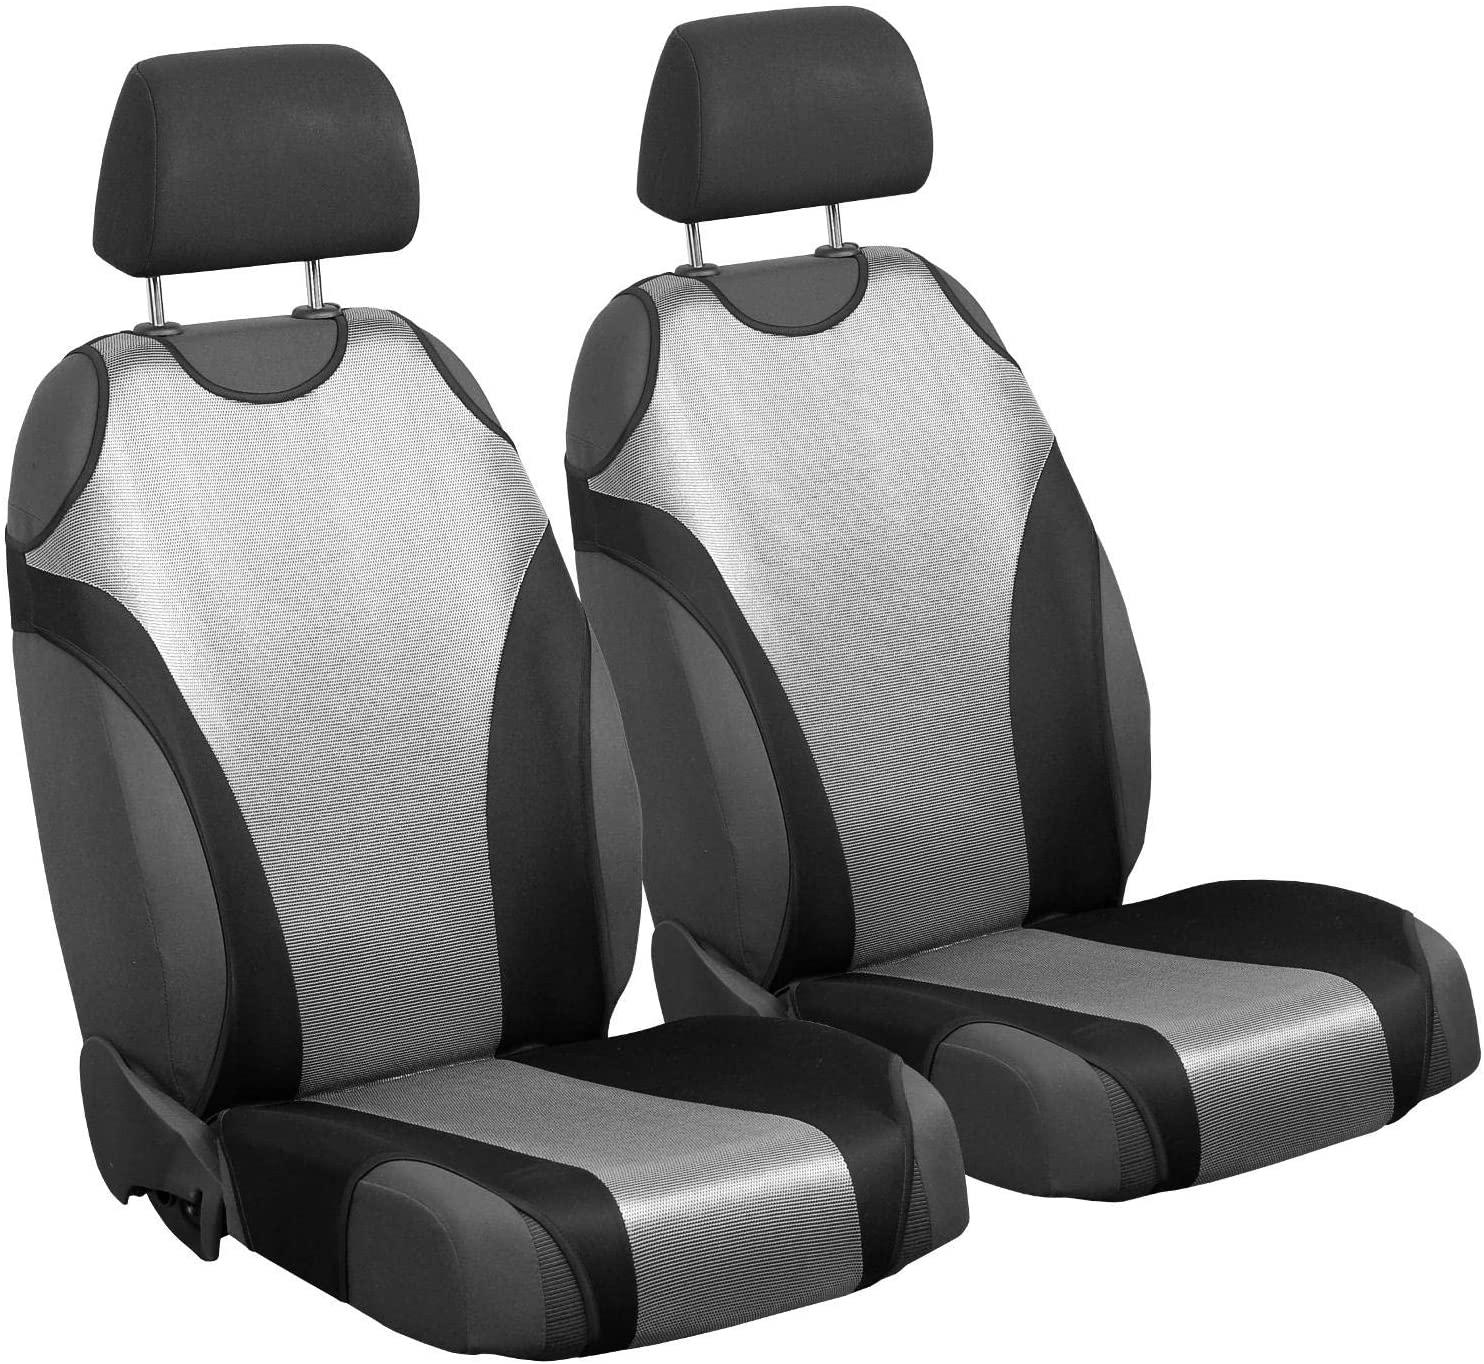 Zakschneider Car Seat Covers for Corrado - Front Seats - Color Premium Silver & Black